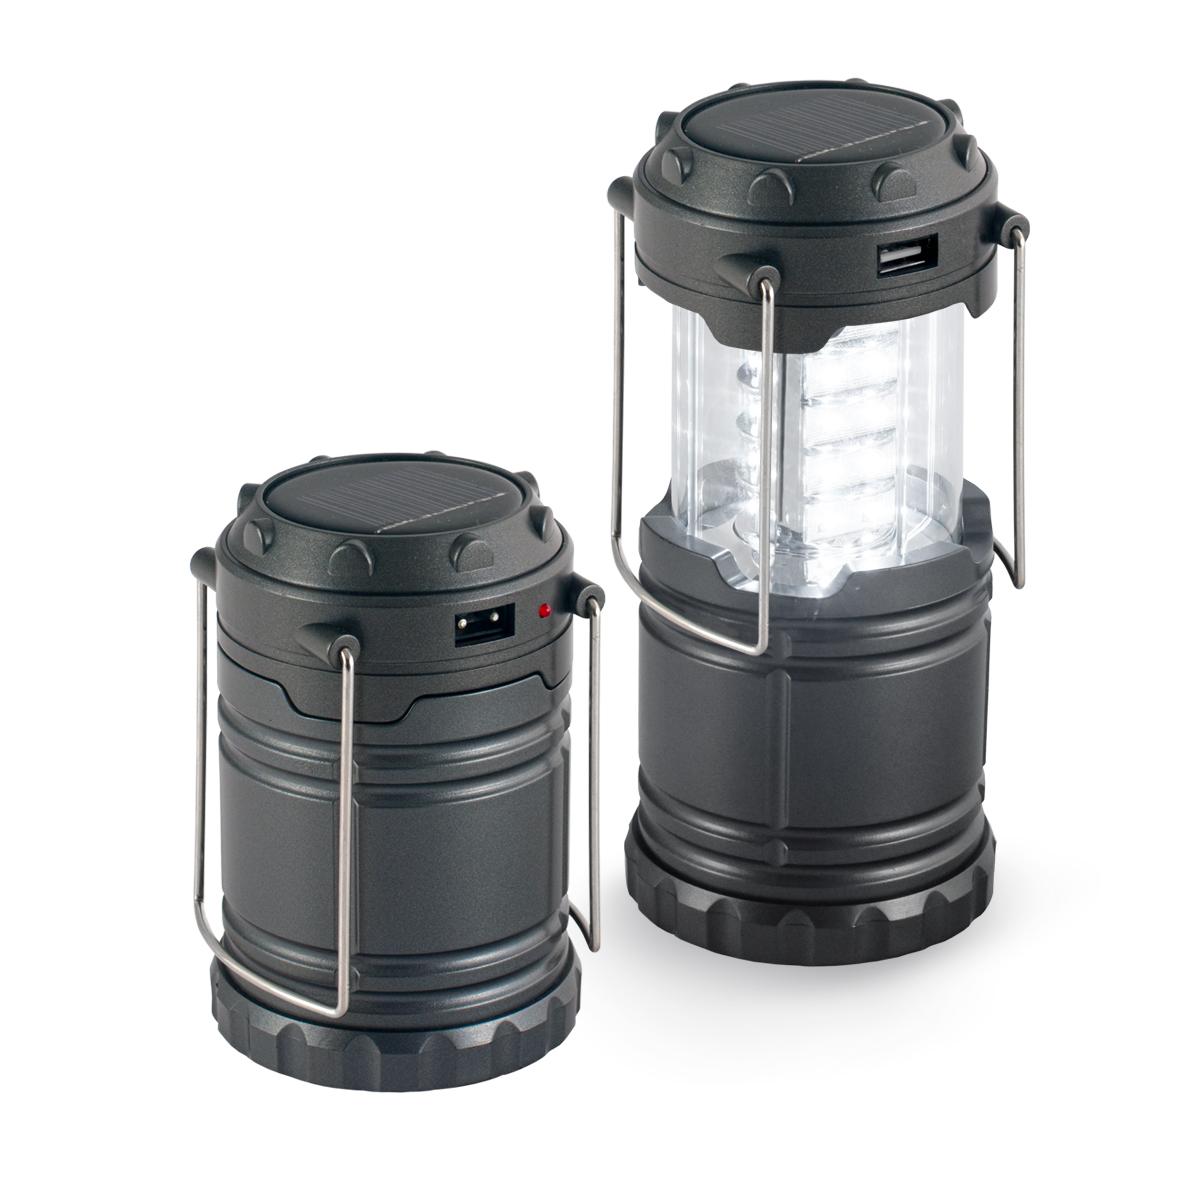 OUTDOOR SOLAR CAMPING LAMP